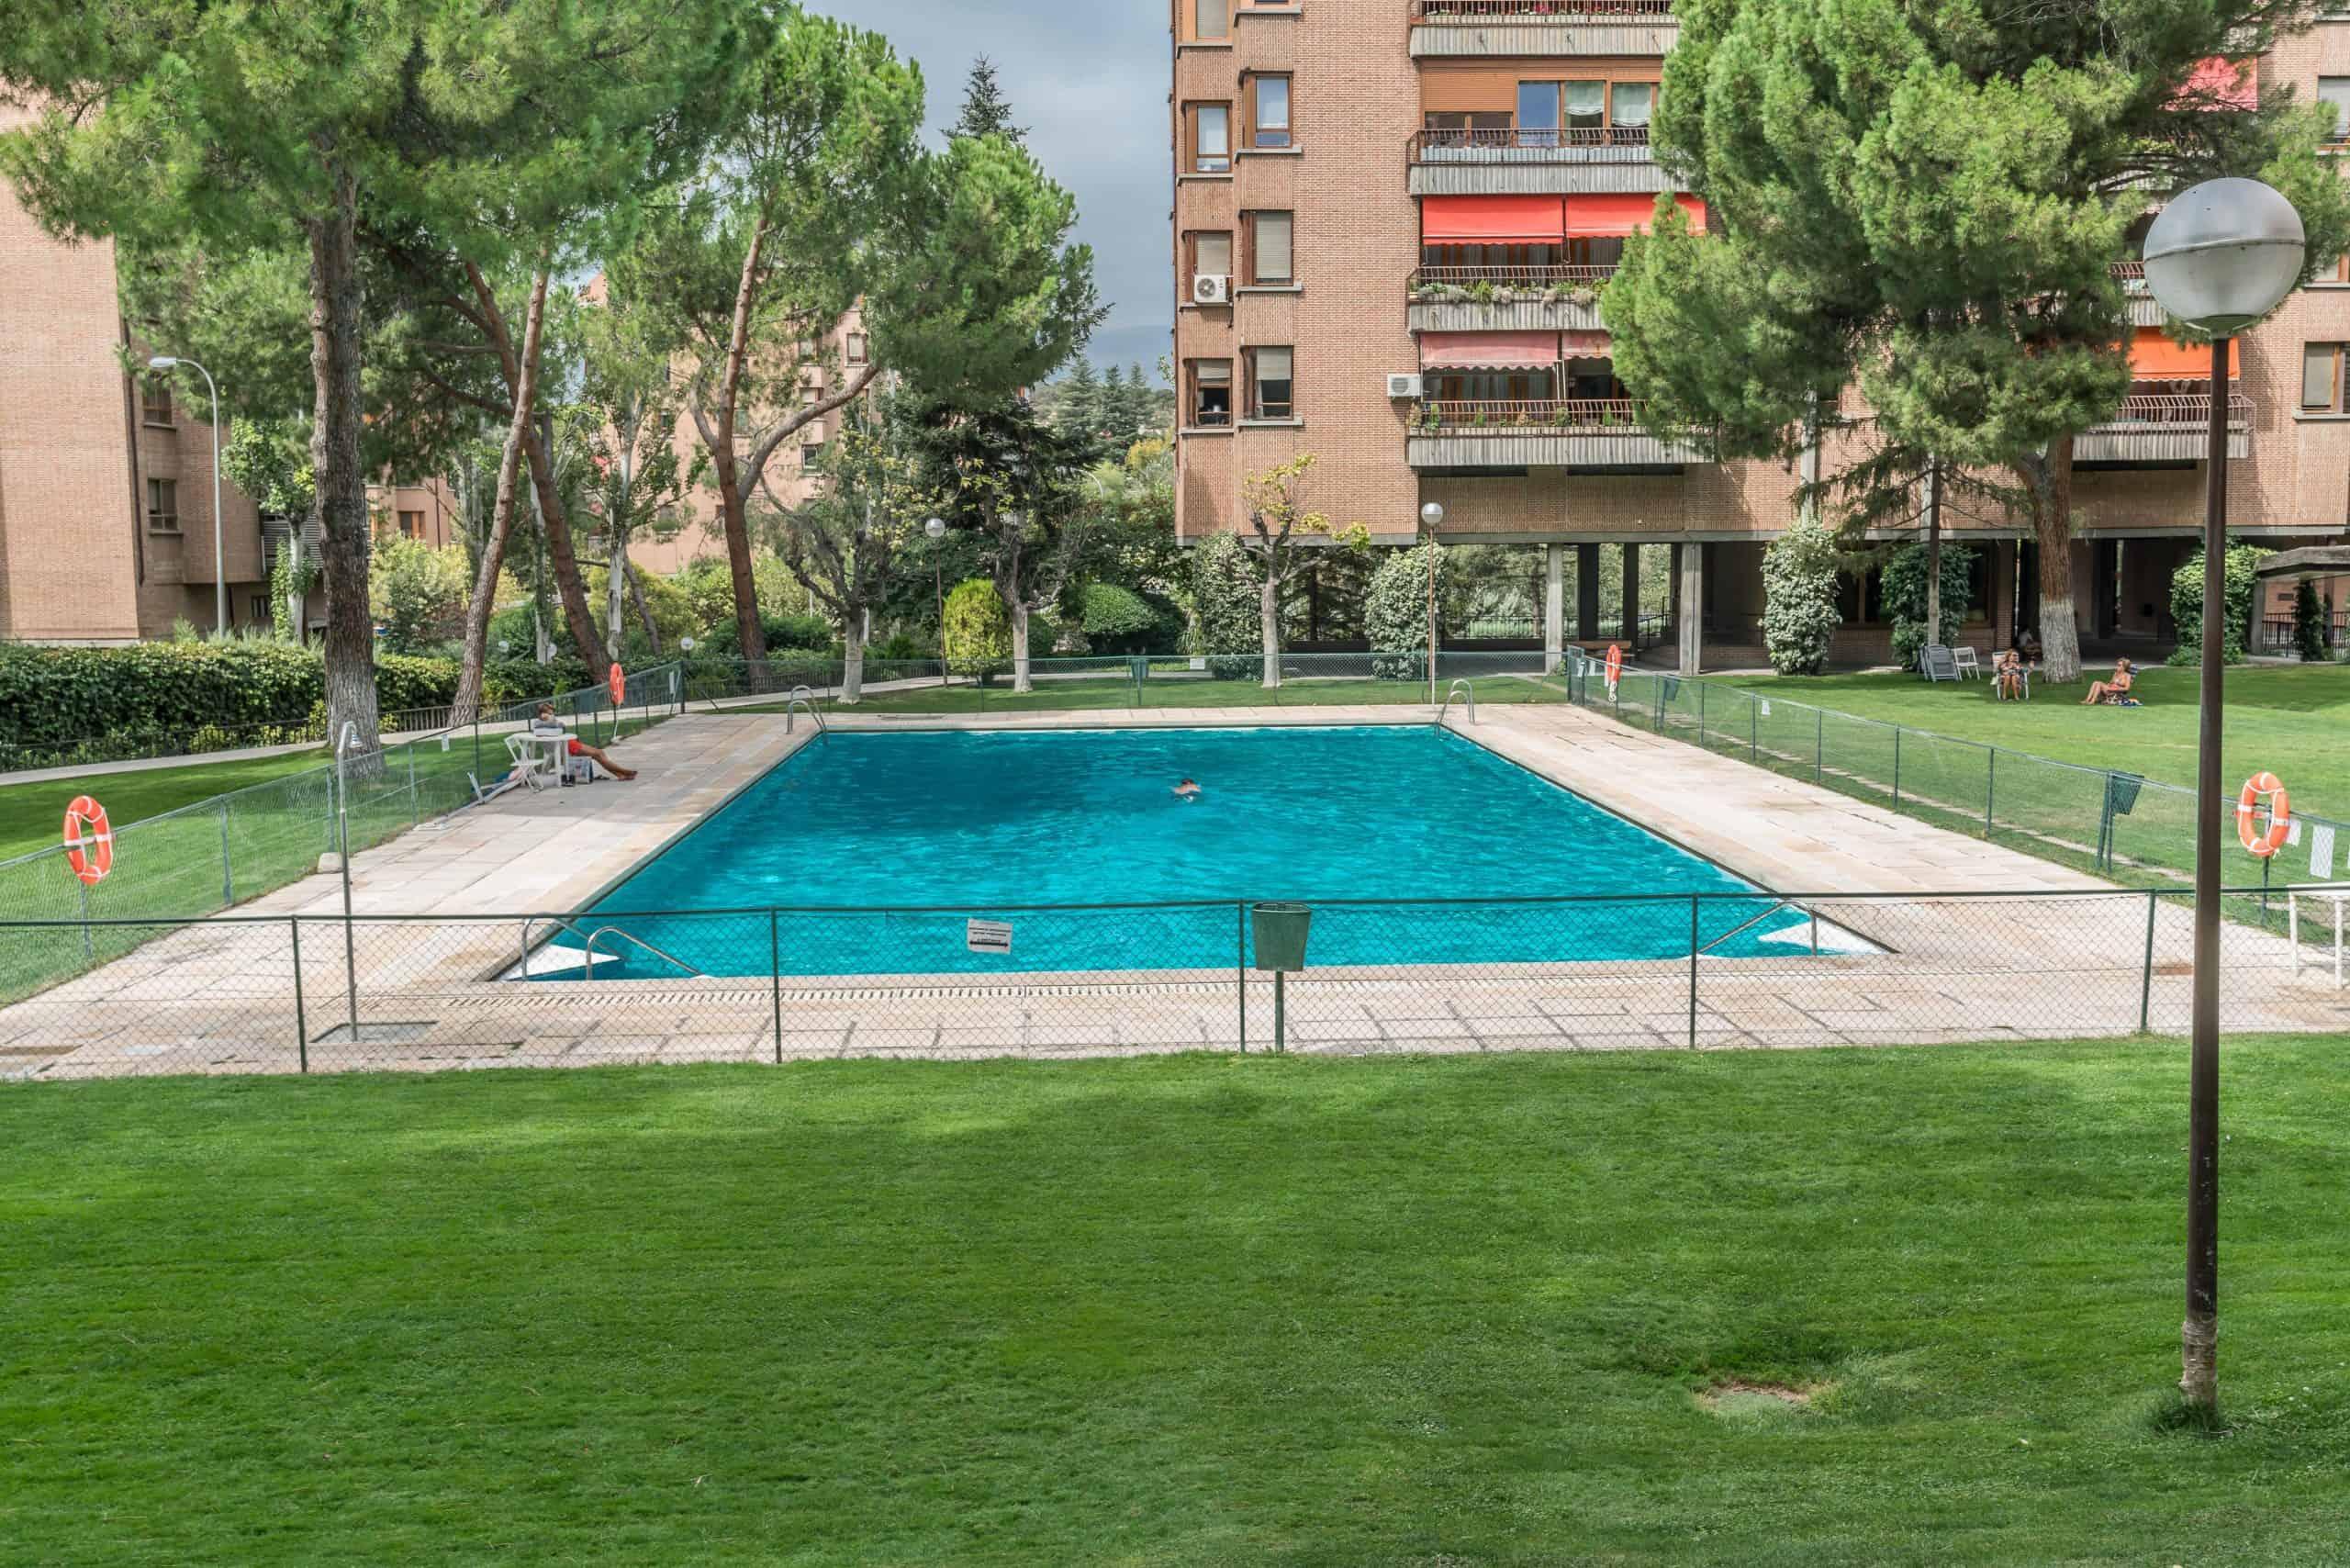 Agencia Inmobiliaria de Madrid-FUTUROCASA-Zona ARGANZUELA-EMBAJADORES-LEGAZPI -calle Embajadores- baño 173